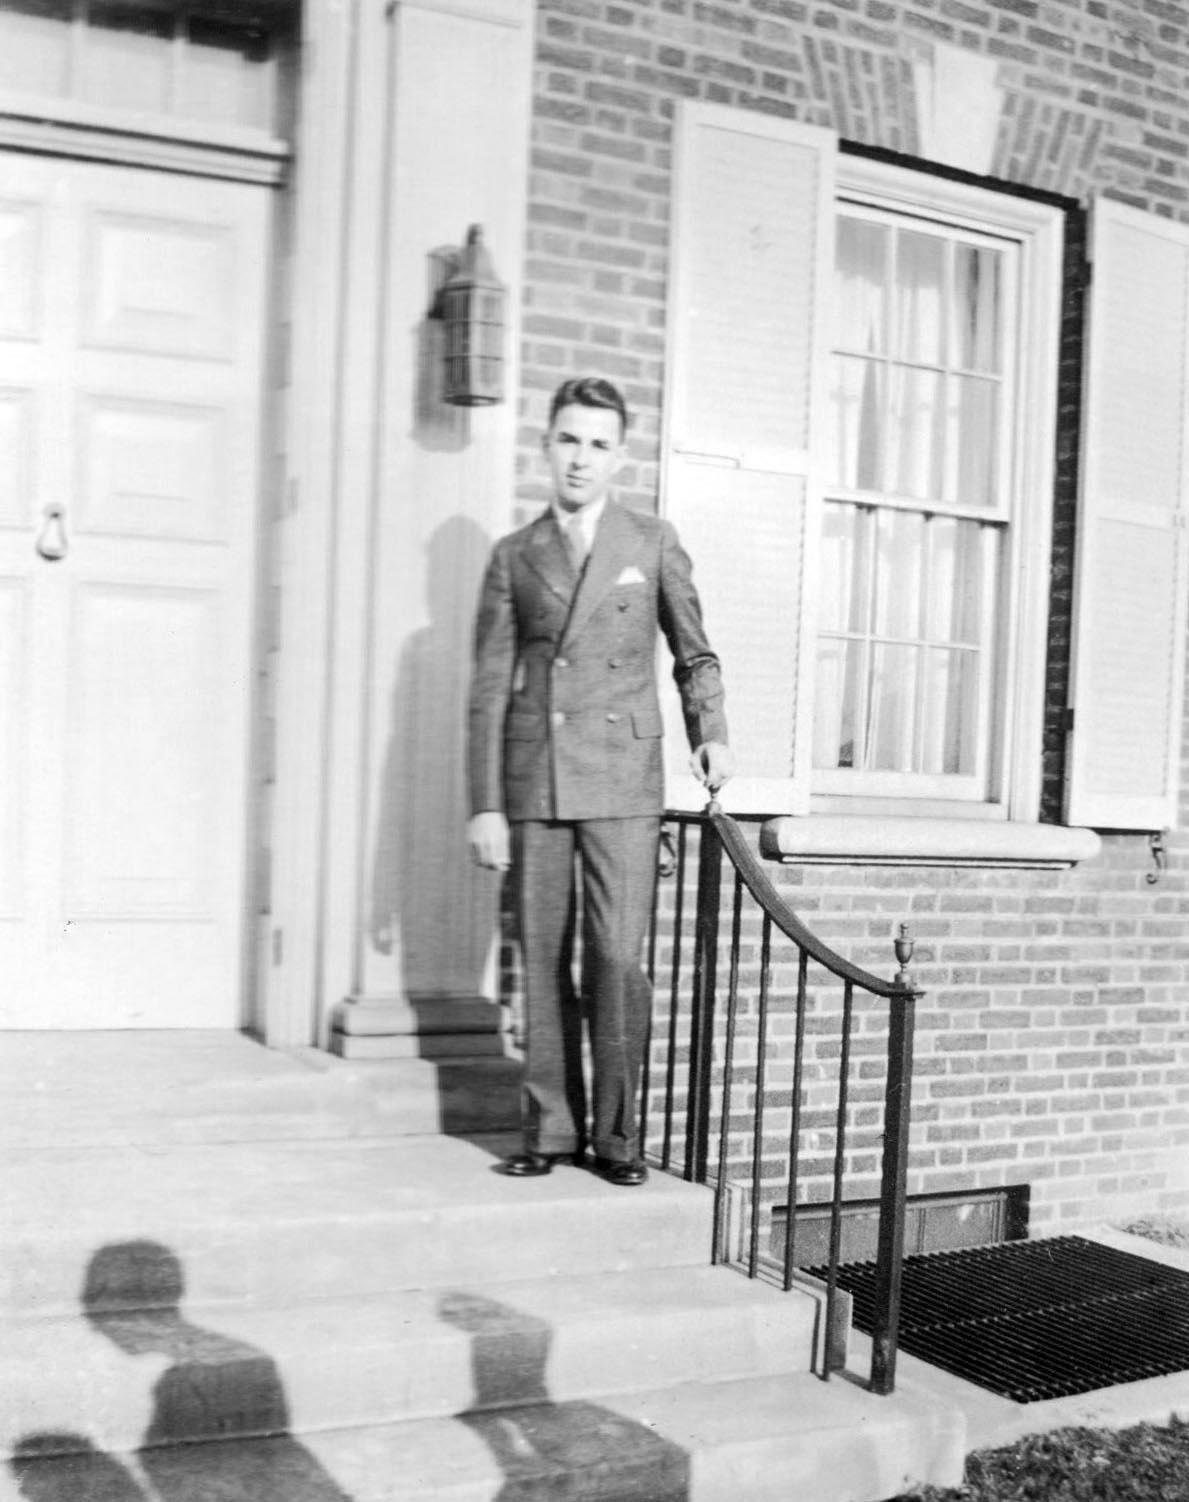 Robert L. Grun 1935